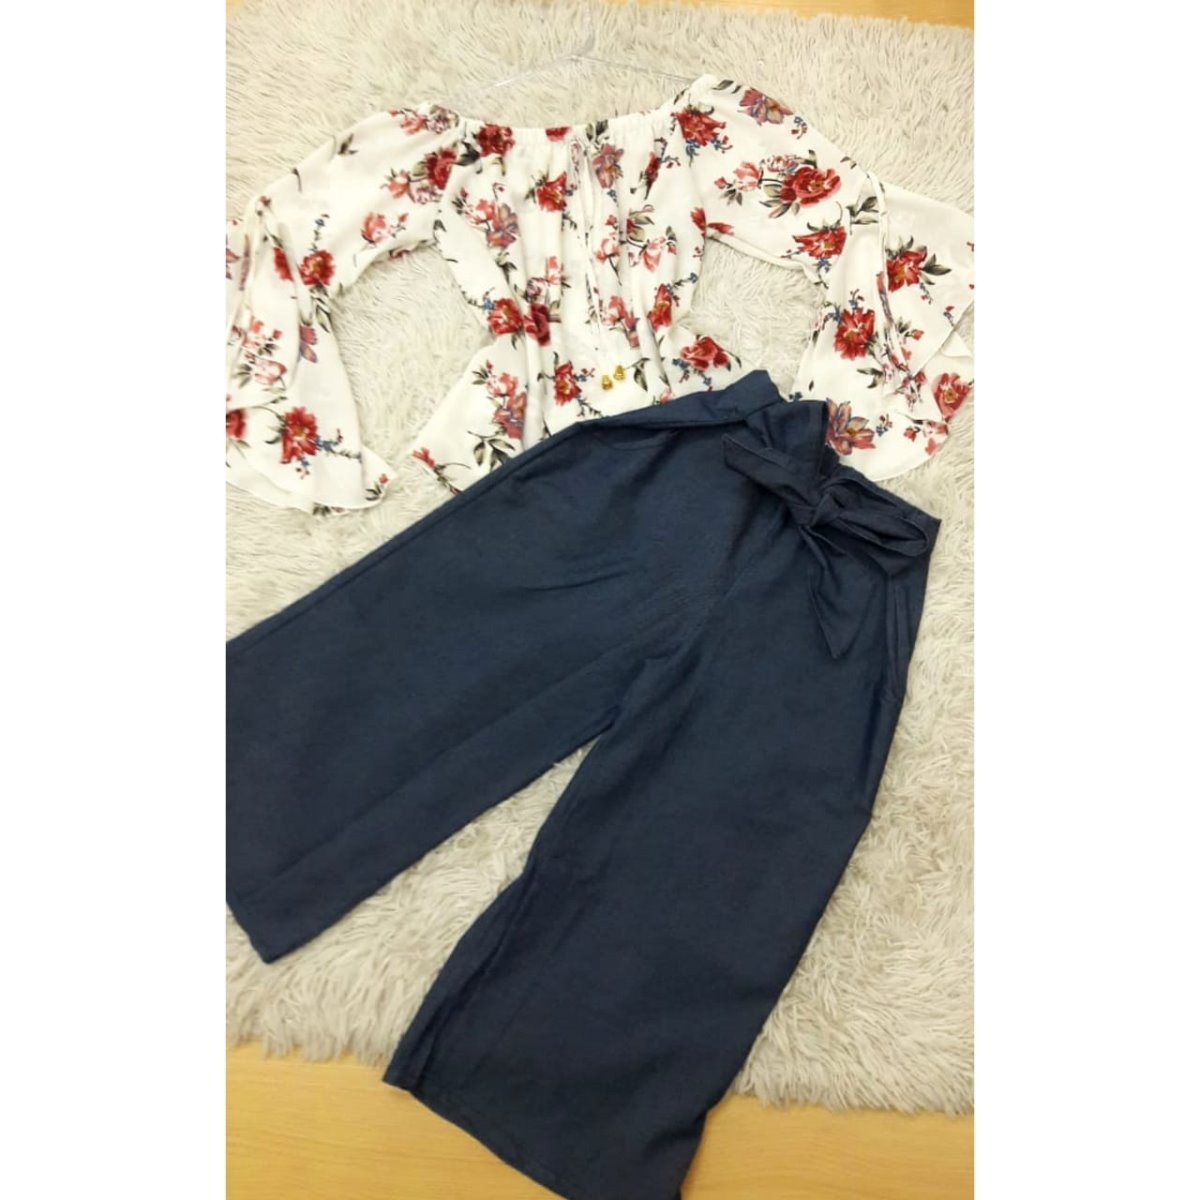 8c67b4dd5f blusa feminina ciganinha manga flare estampa floral crepe. Carregando zoom.